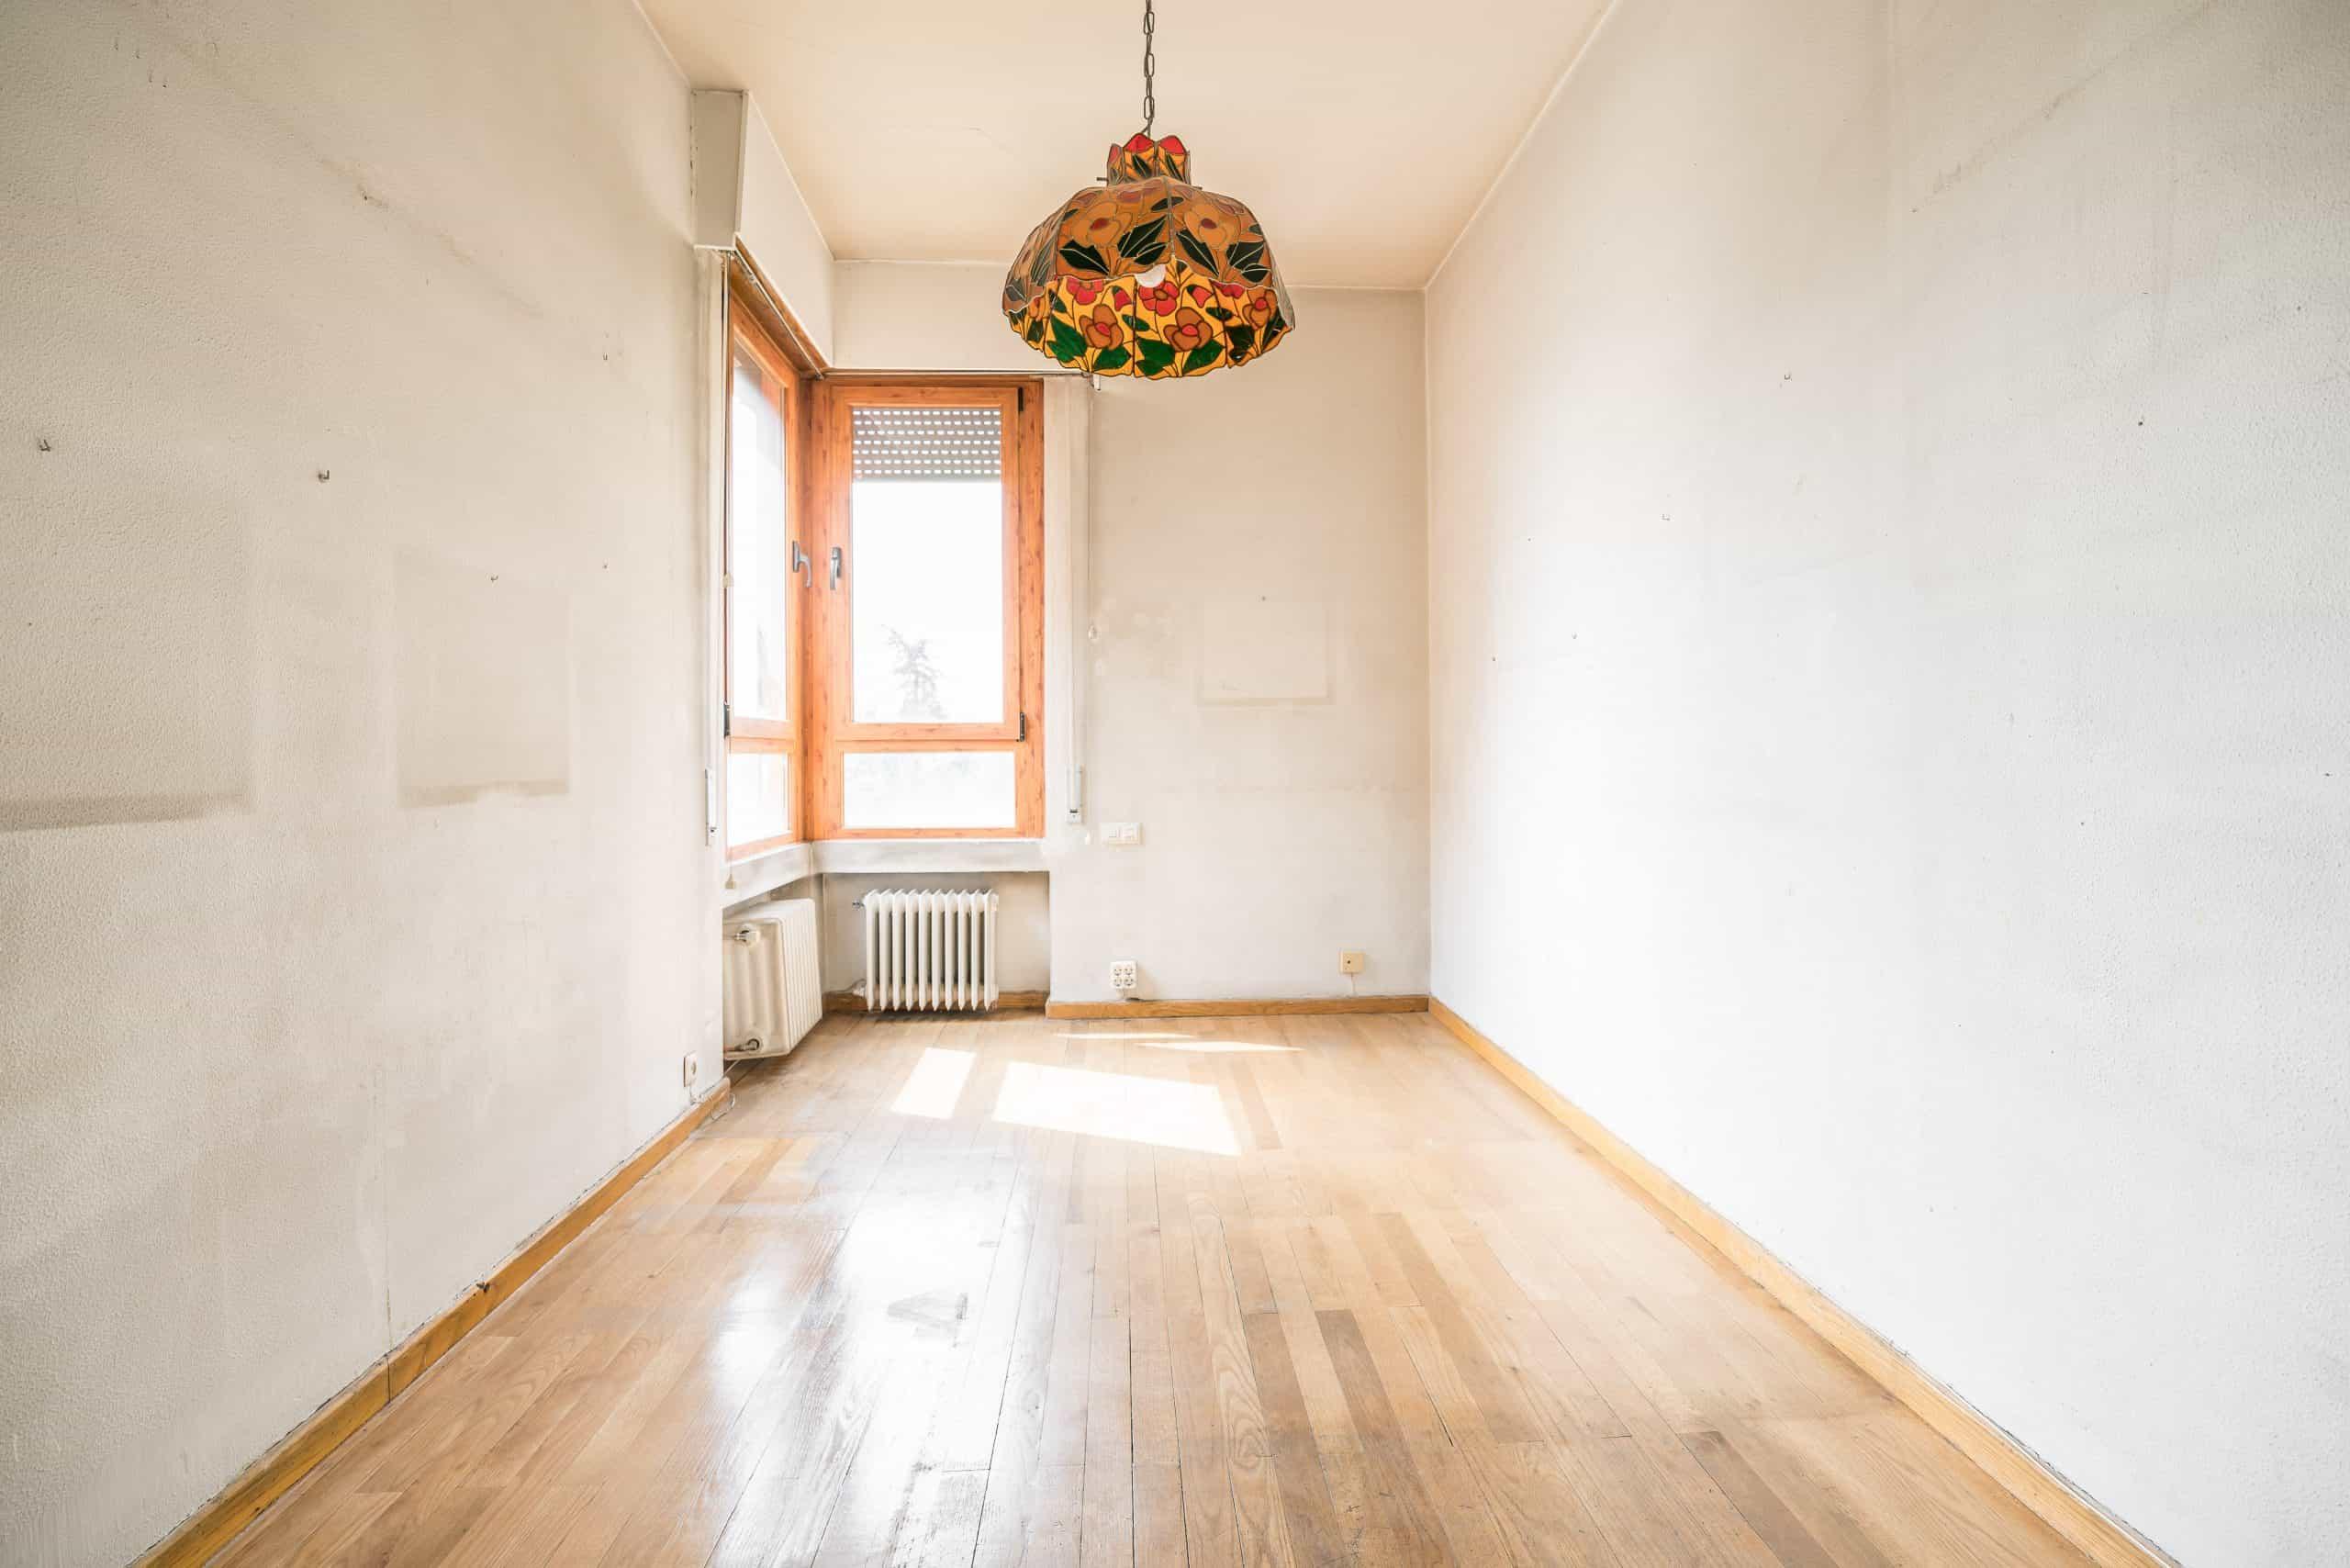 Agencia Inmobiliaria de Madrid-FUTUROCASA-Zona ARGANZUELA-EMBAJADORES-LEGAZPI -calle Embajadores- baño 23